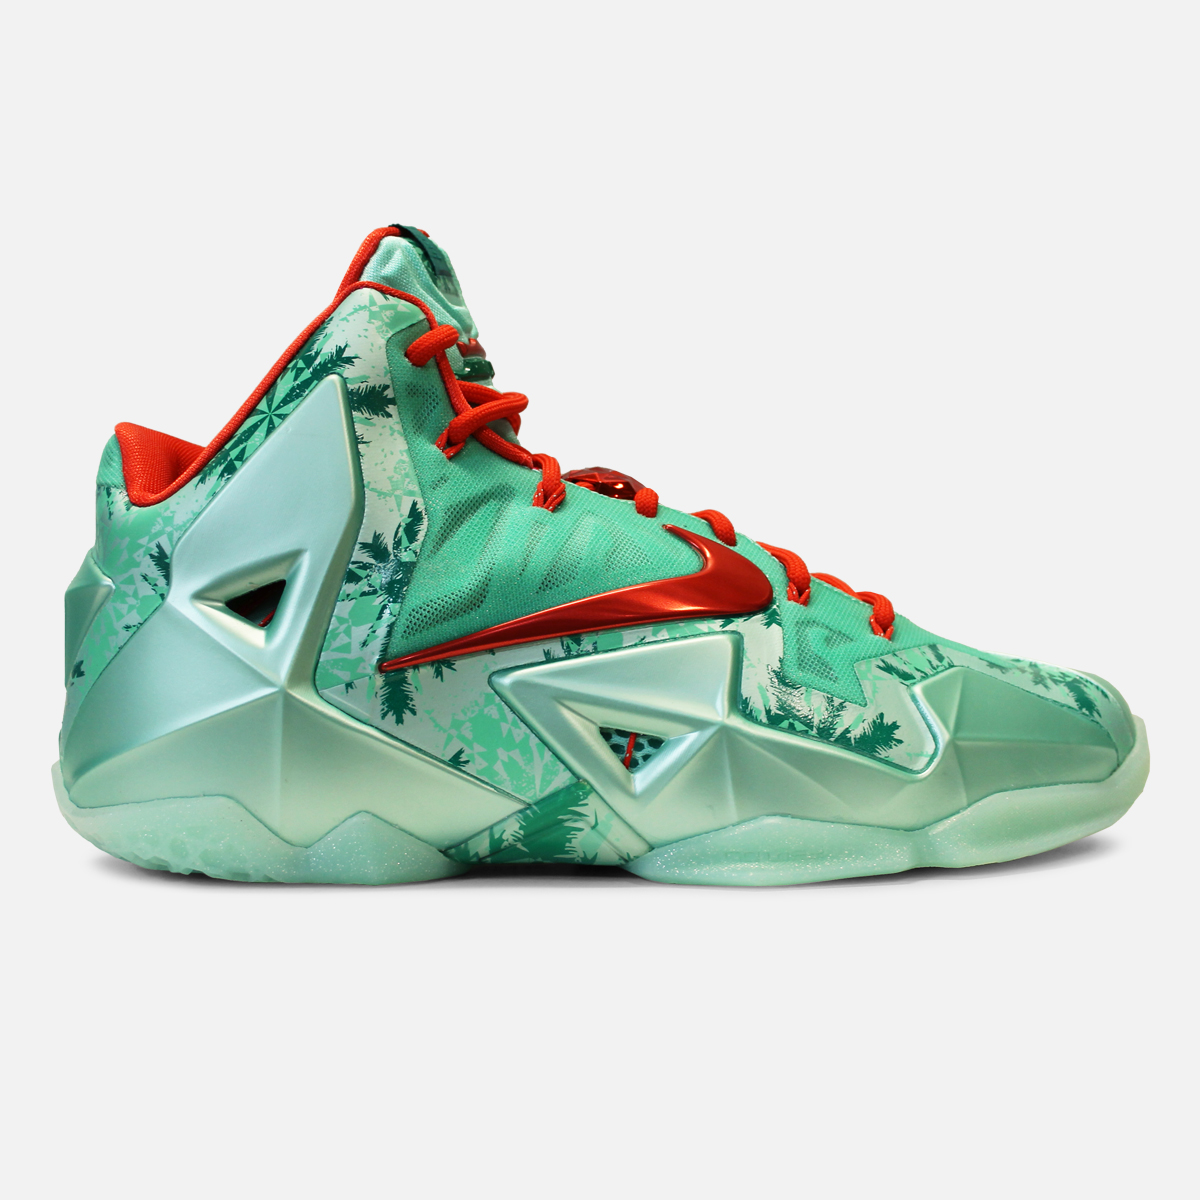 Nike Lebron 11 - Nike Lebron 11 Christmas Restock Shoe Palace En Ligne